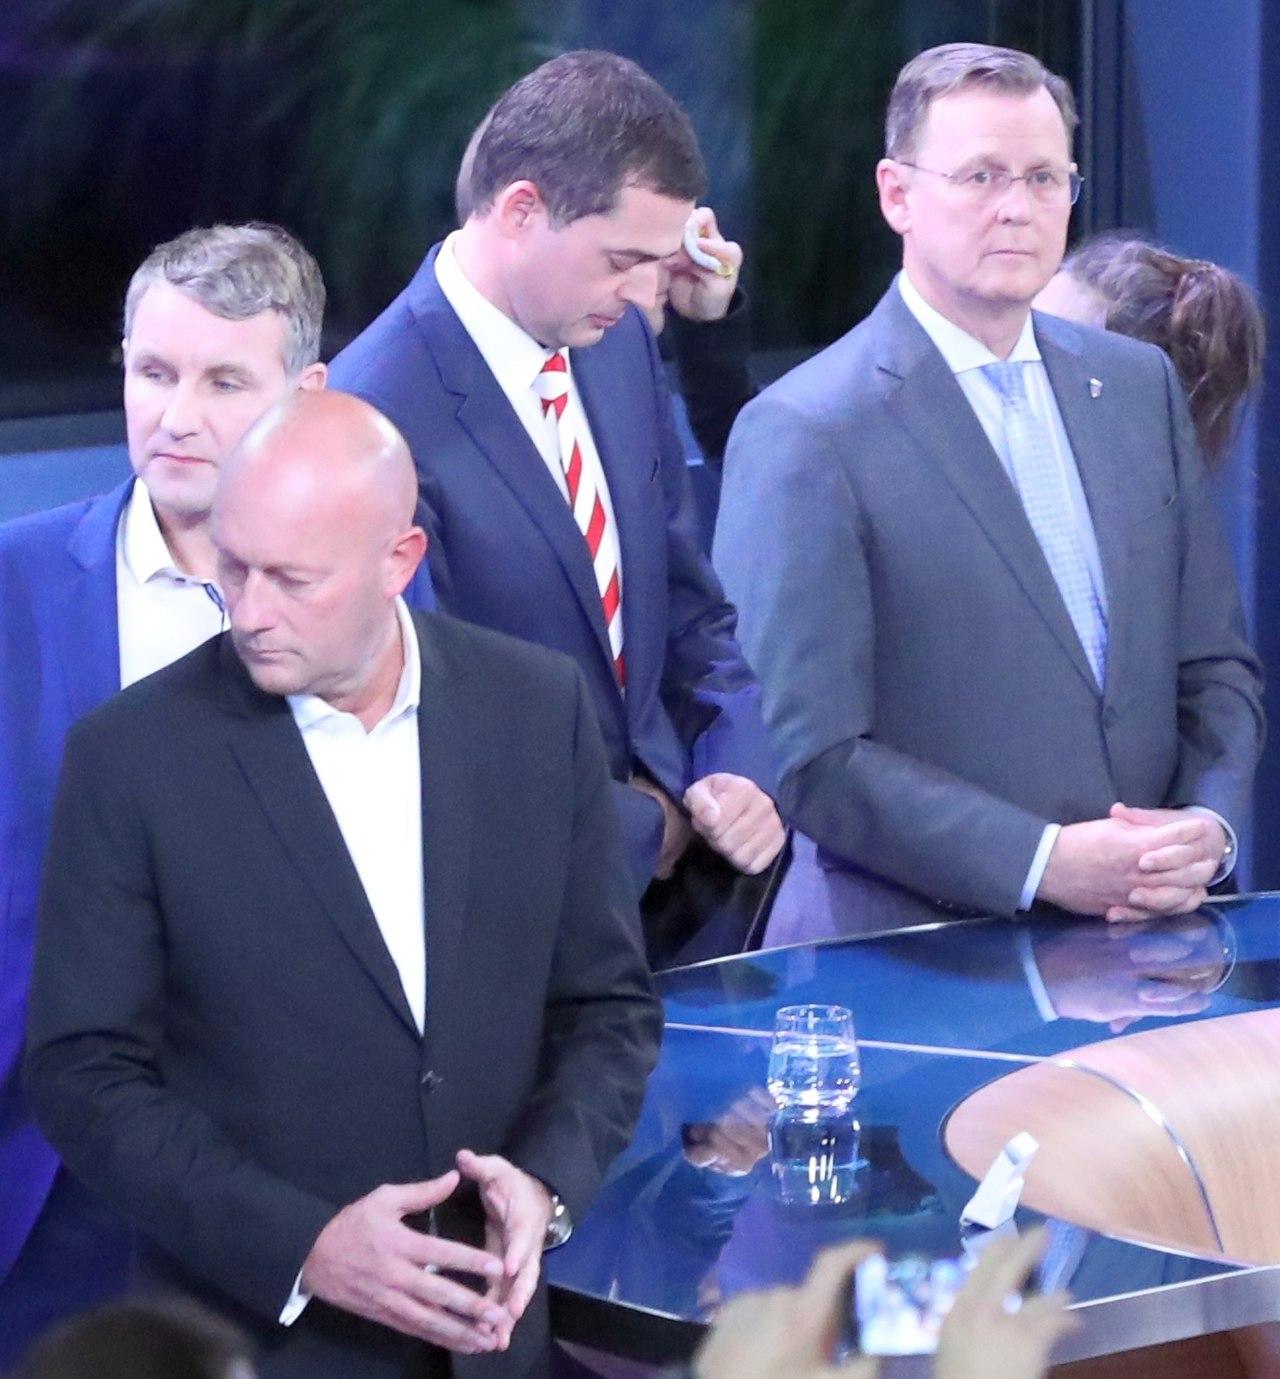 2019-10-27 Wahlabend Thüringen by Sandro Halank–51.jpg